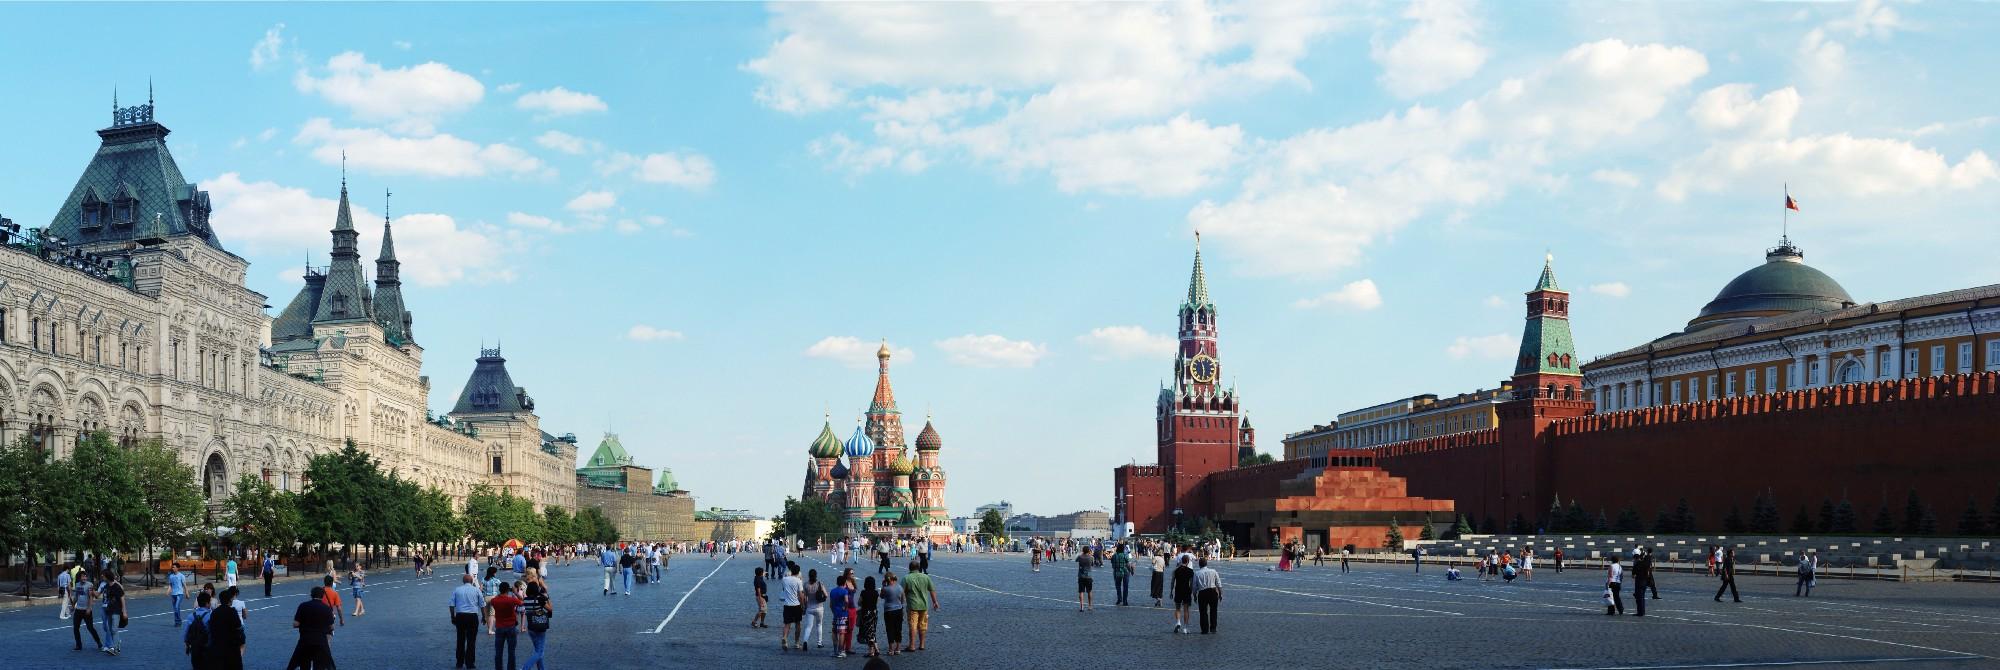 Russia explains Twitter diplomacy